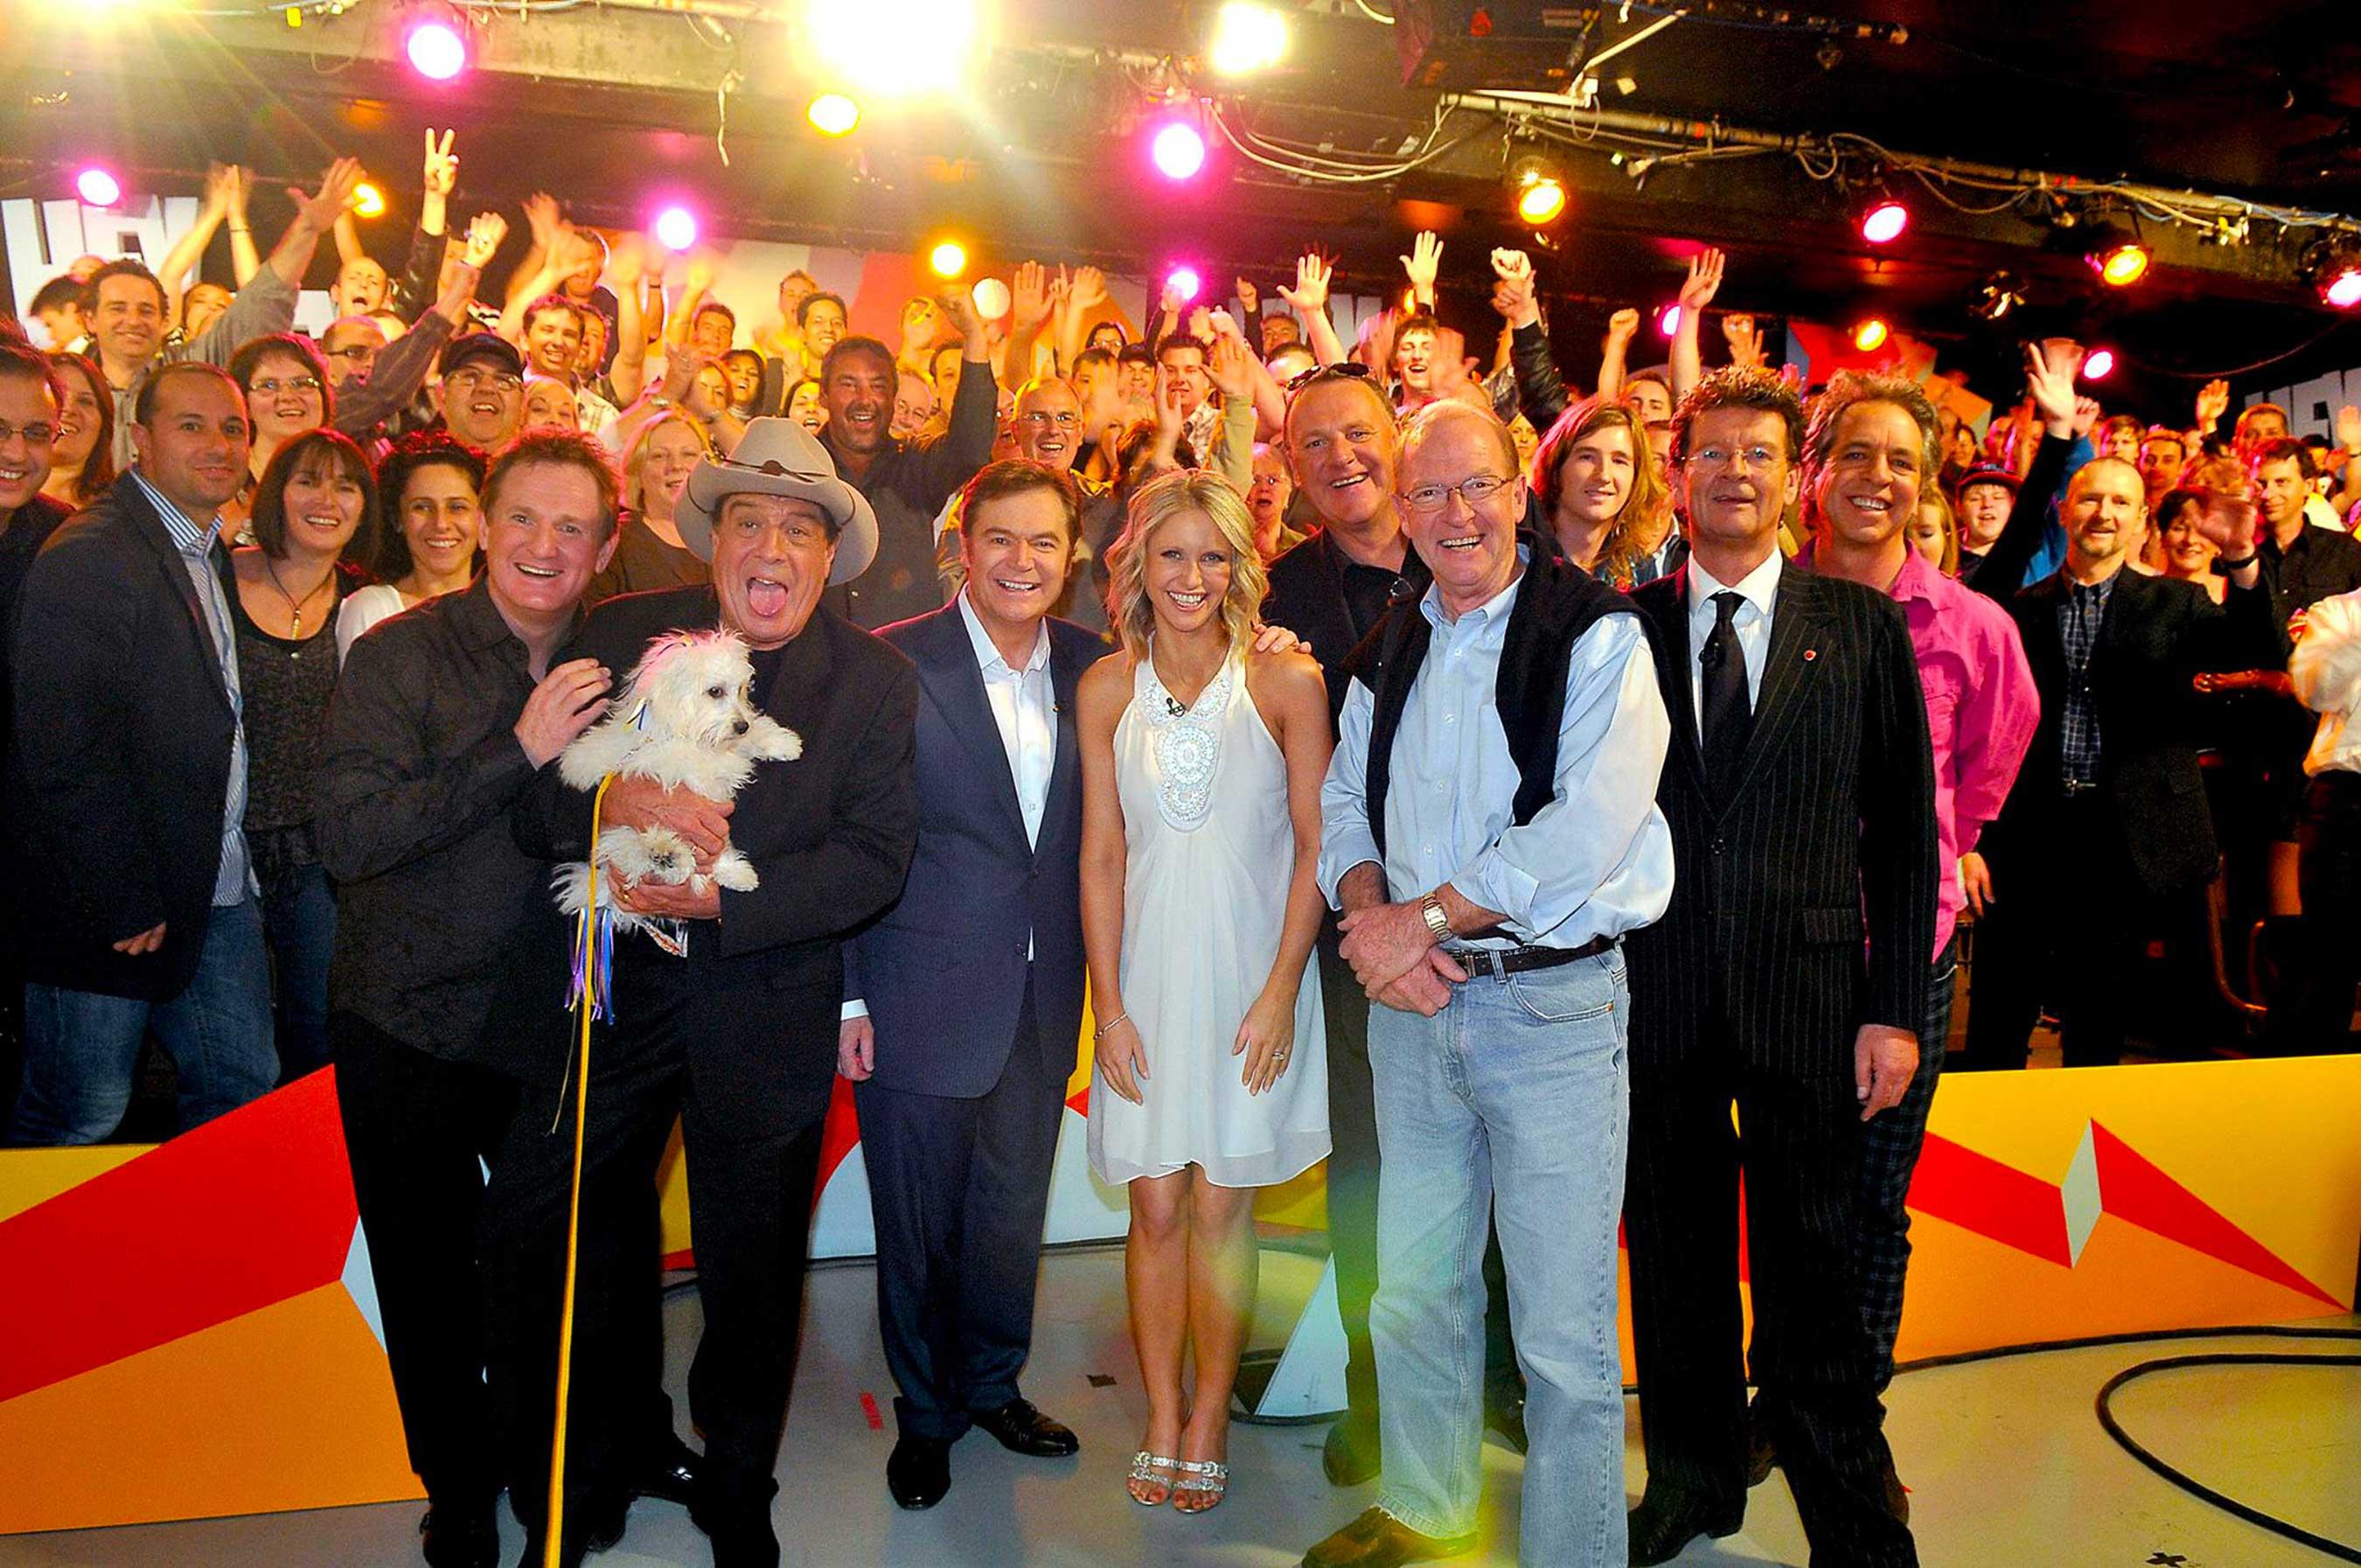 Hey Hey its Saturday: The Reunion (2009)